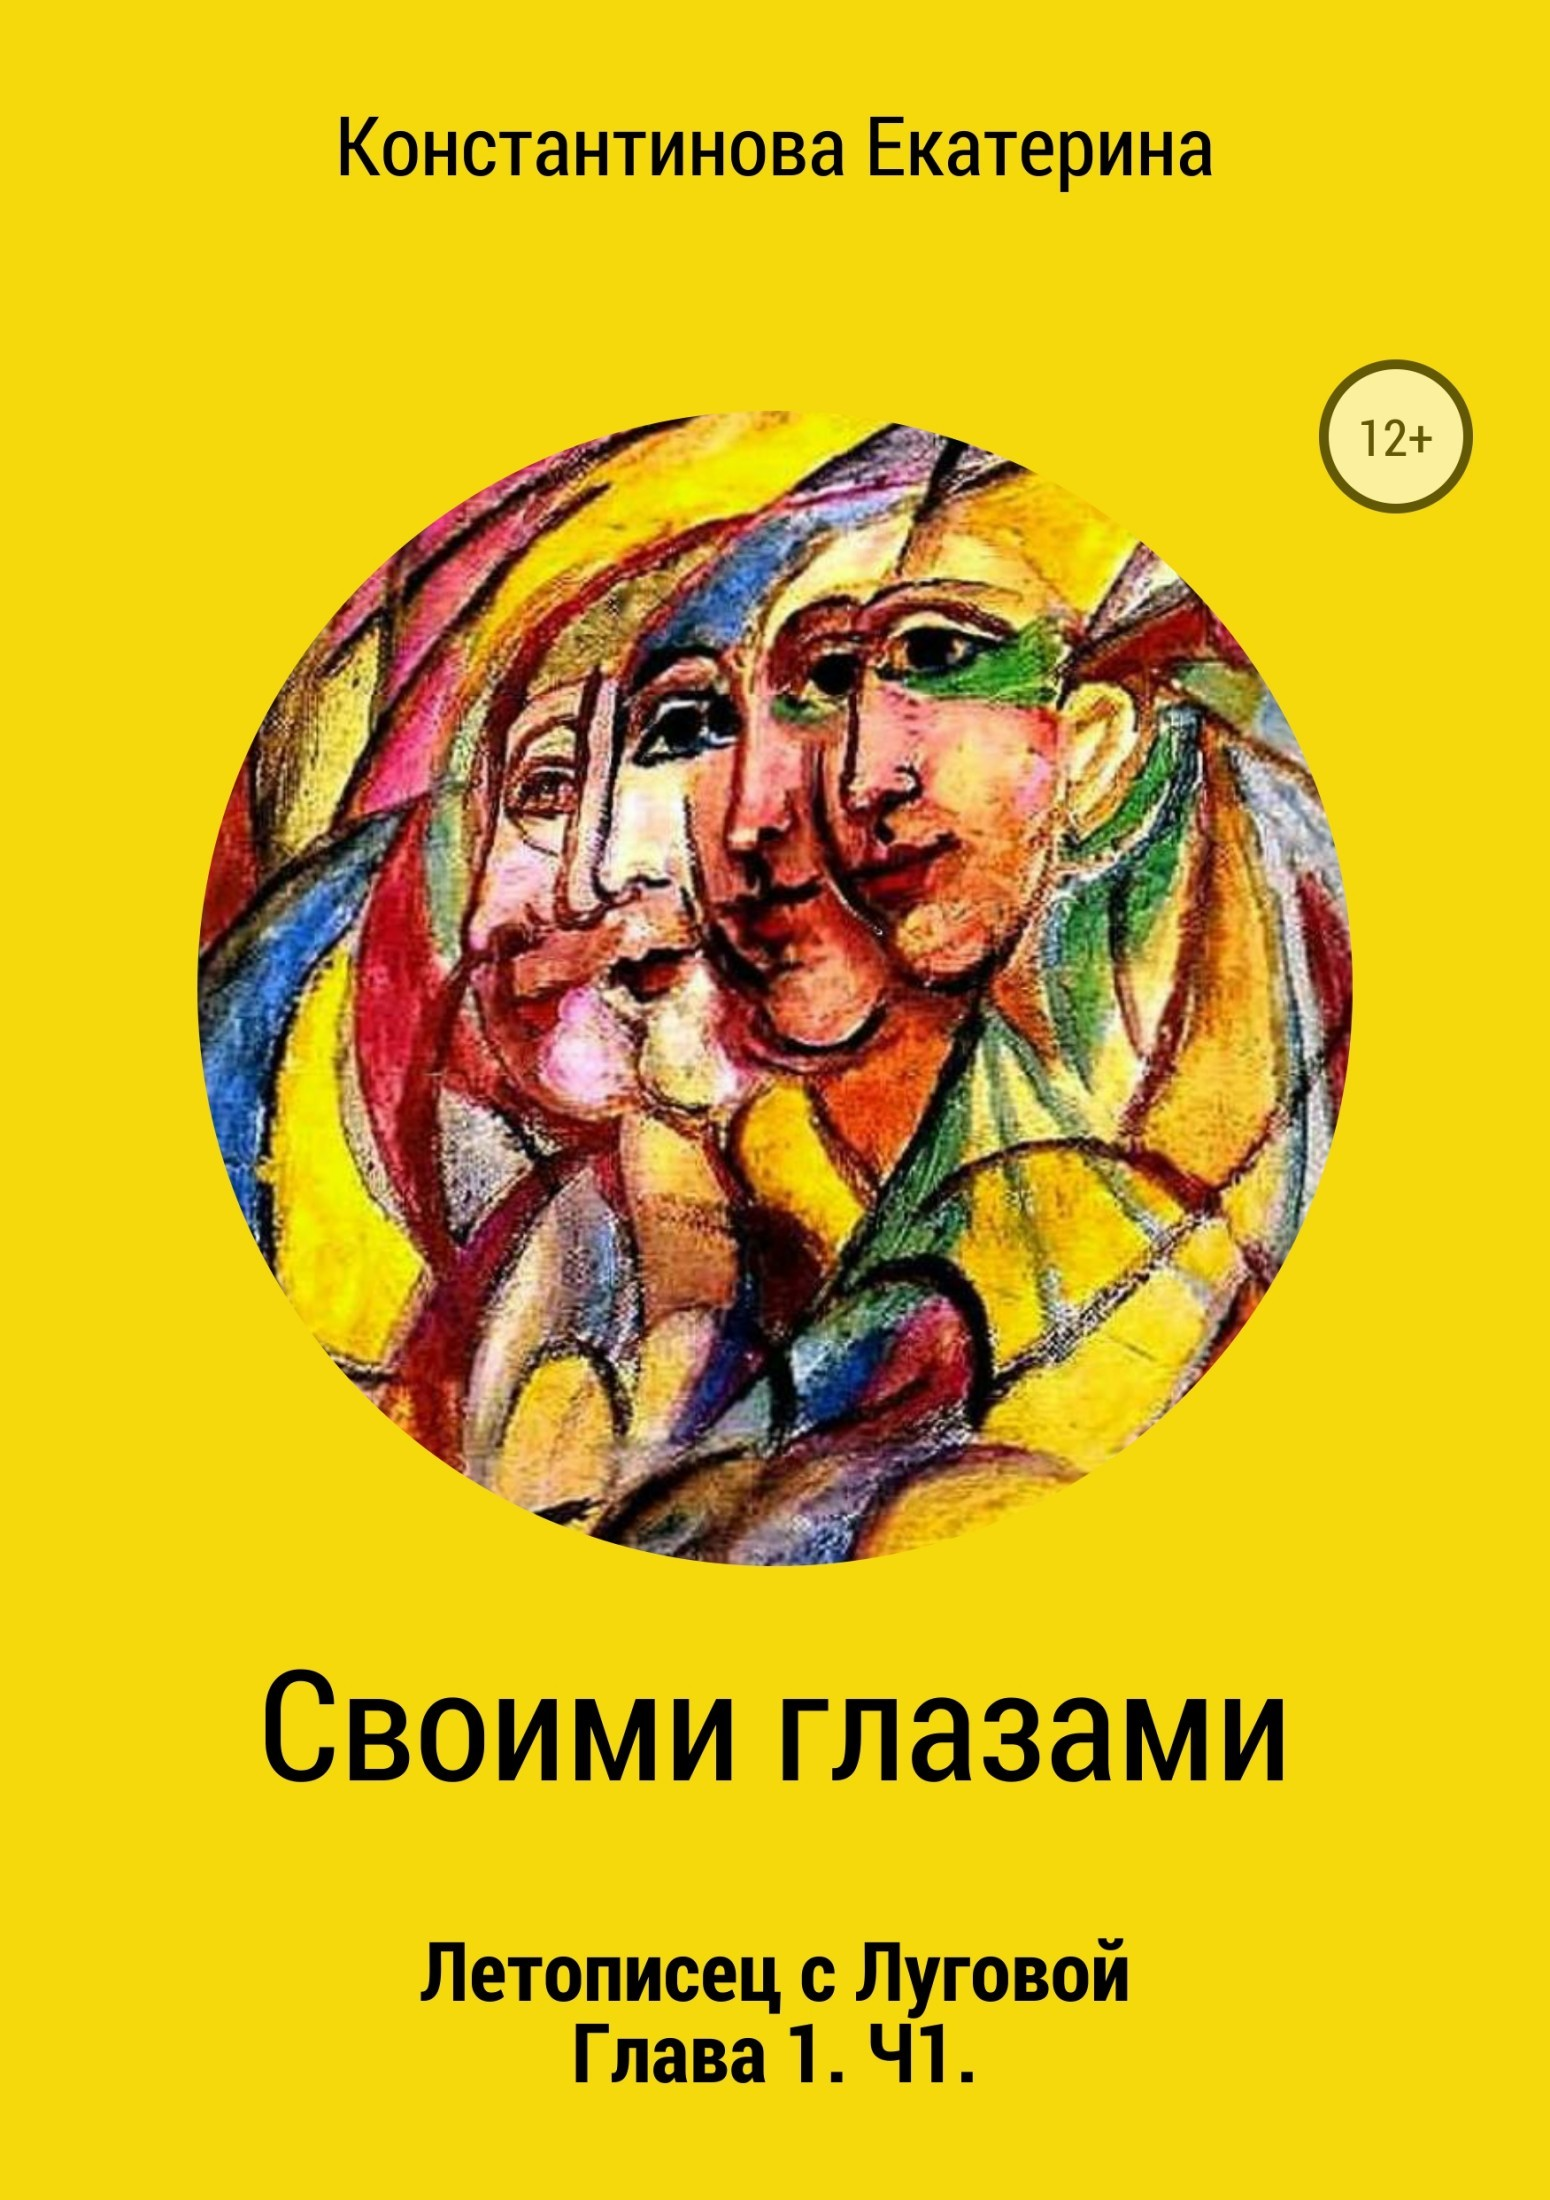 Екатерина Константинова Своими глазами футболка бомж